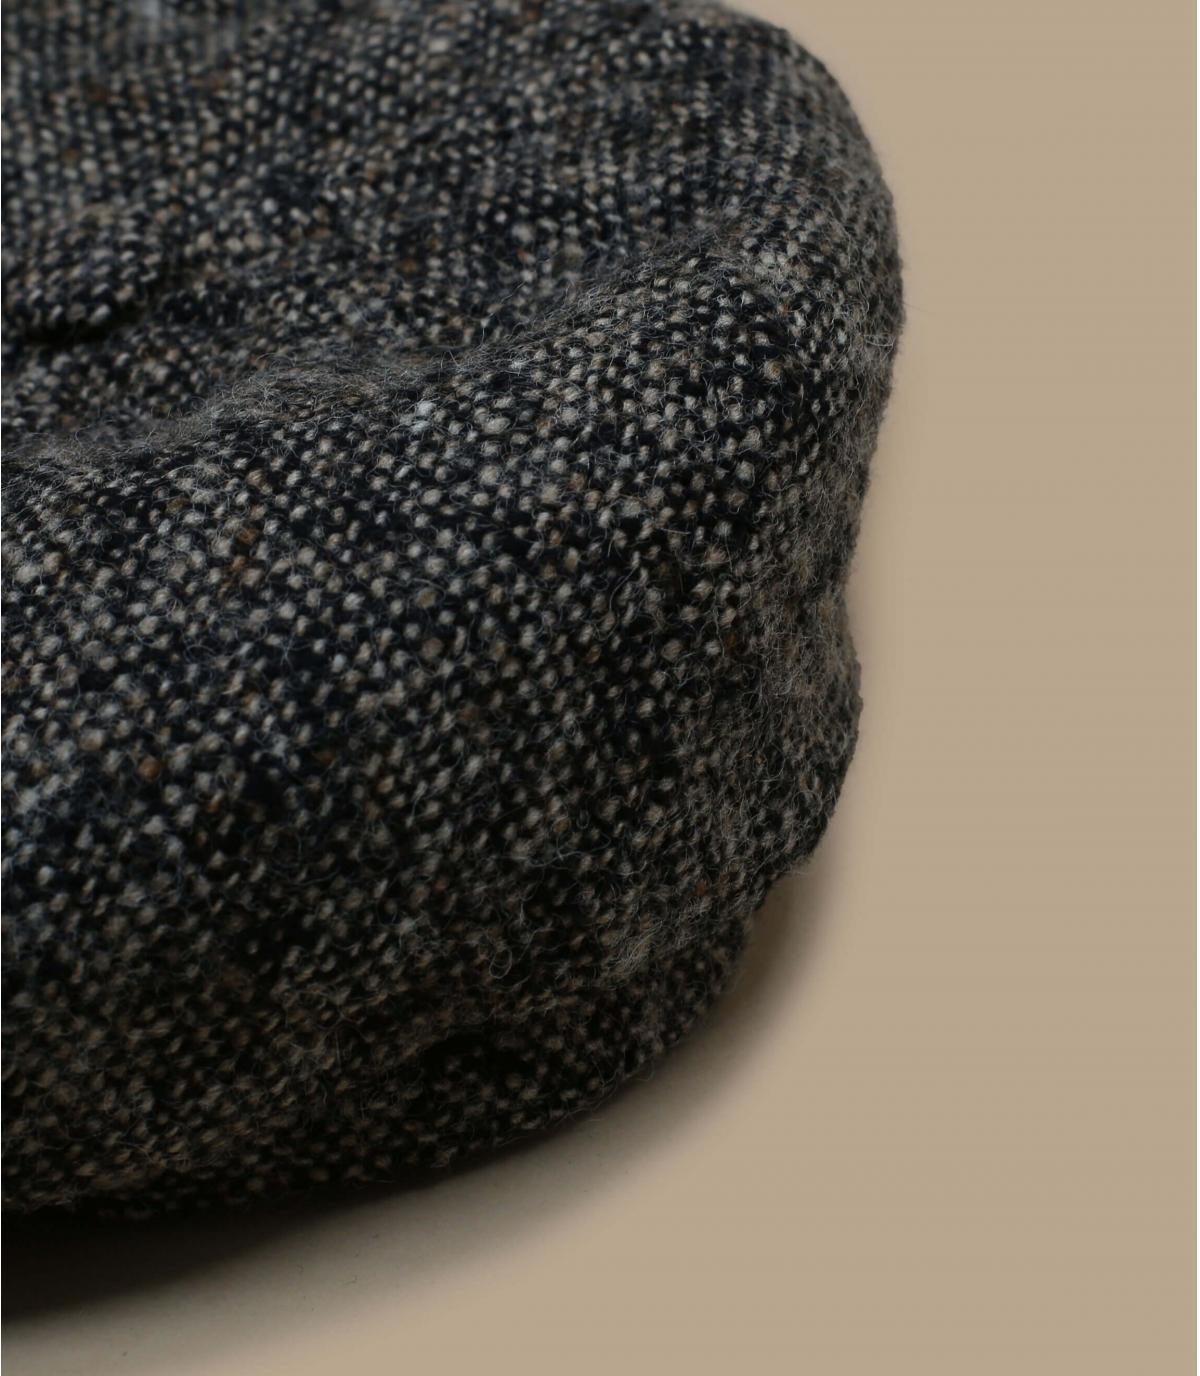 Casquette irlandaise Stetson marron